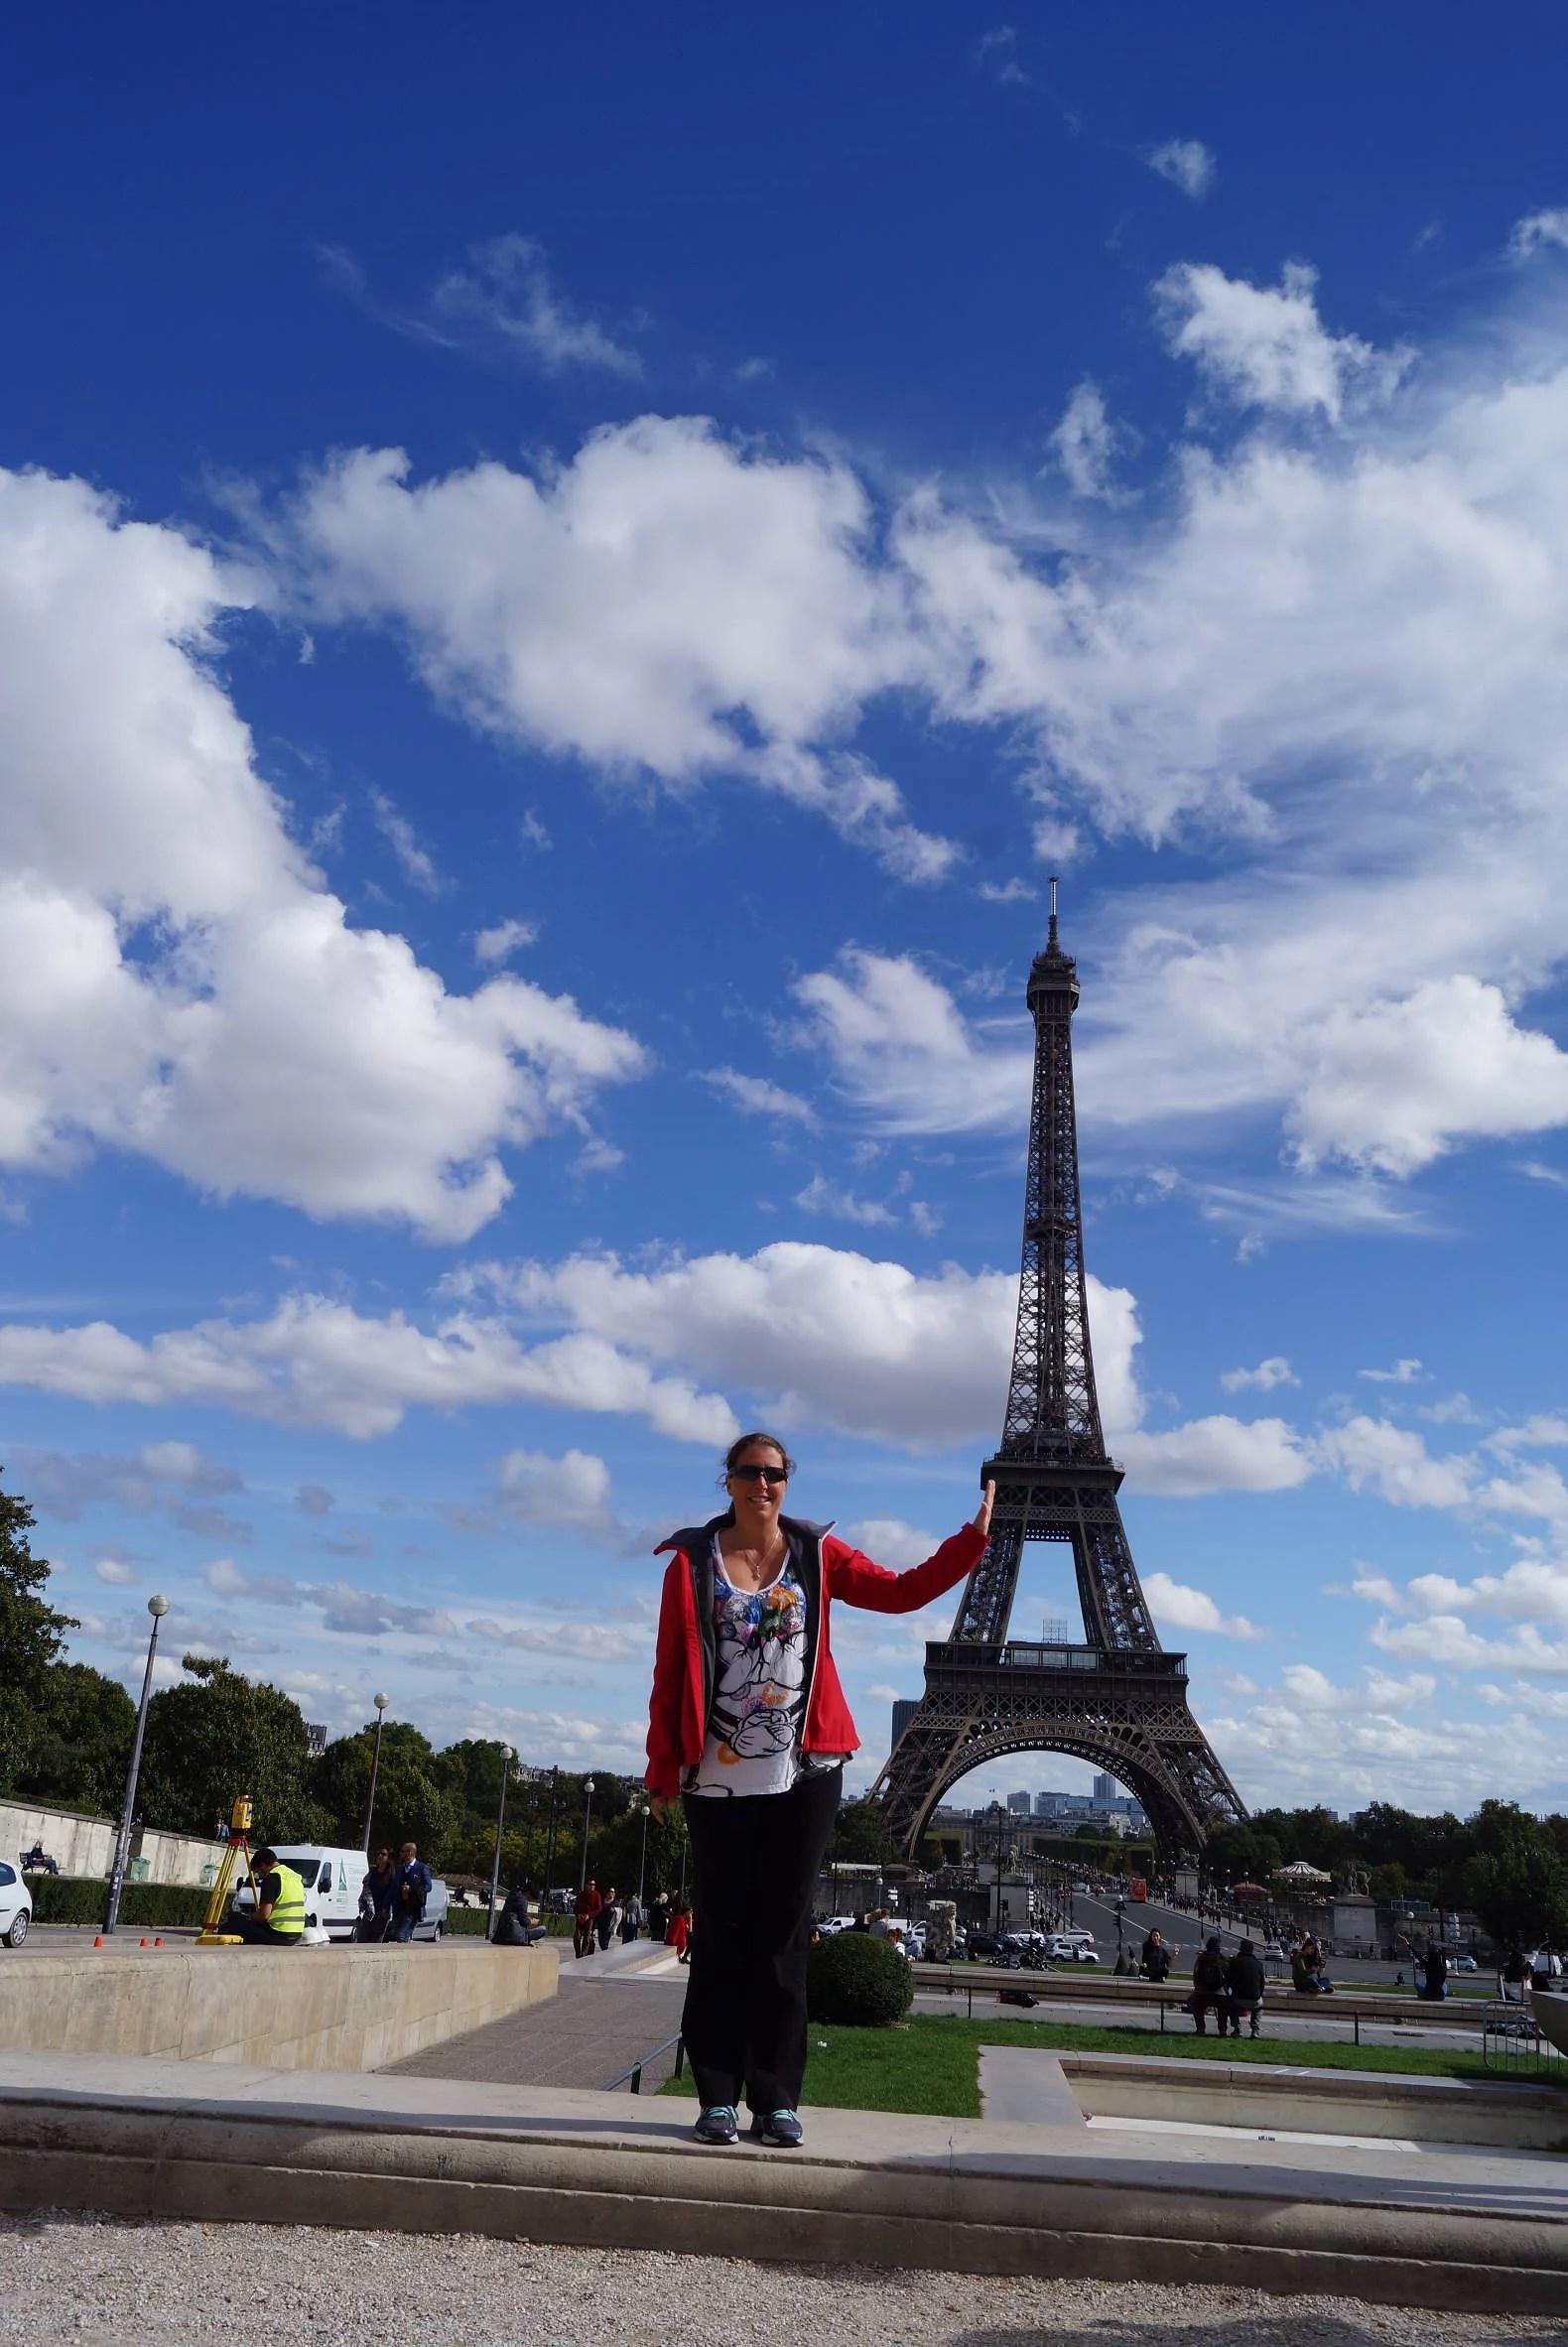 Tåg mellan Paris och Disneyland Paris. Ta tåget från Paris till Disneyland Paris.